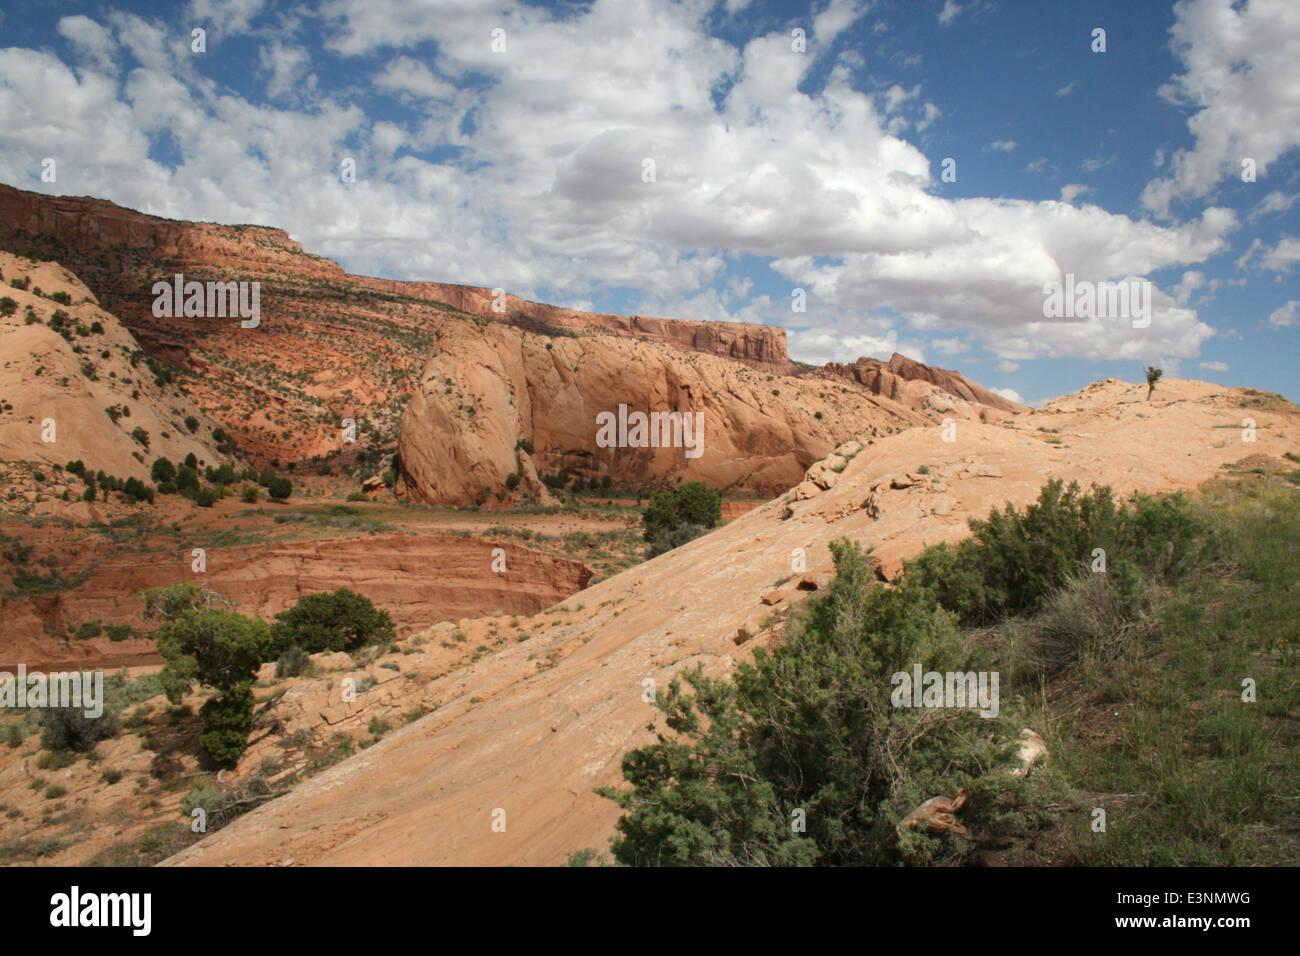 Zion Nationalpark Landschaft Stock Photo